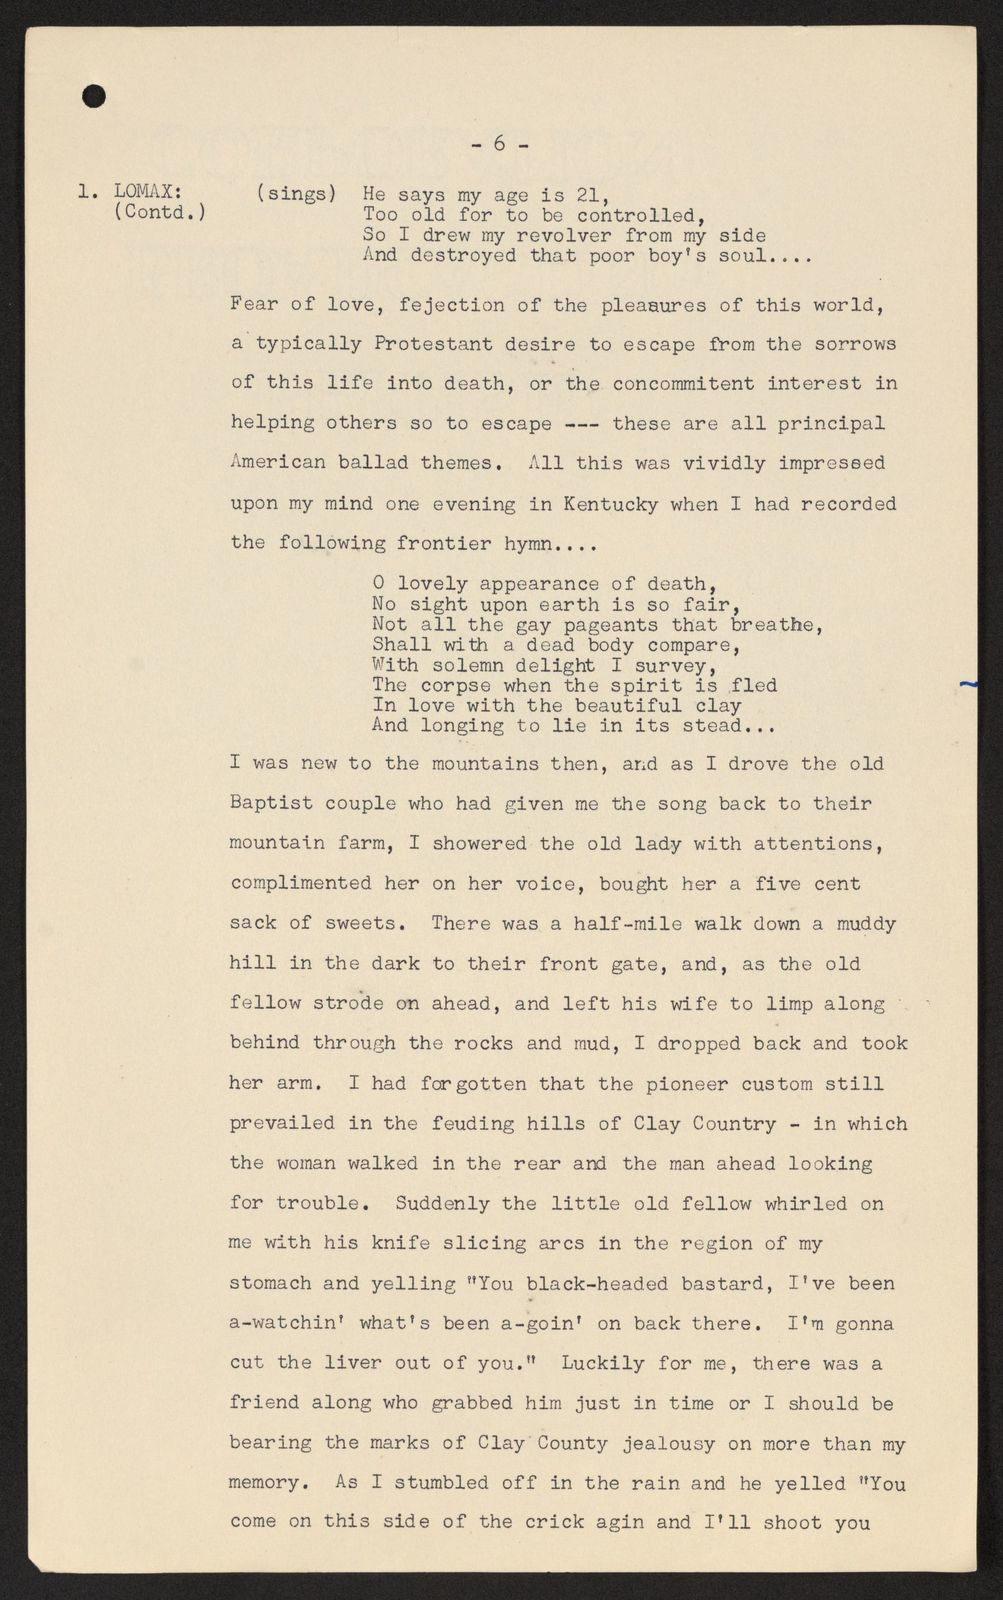 Alan Lomax Collection, Manuscripts, BBC, 1956, Reminiscences of a Folk Song Collector, program 2